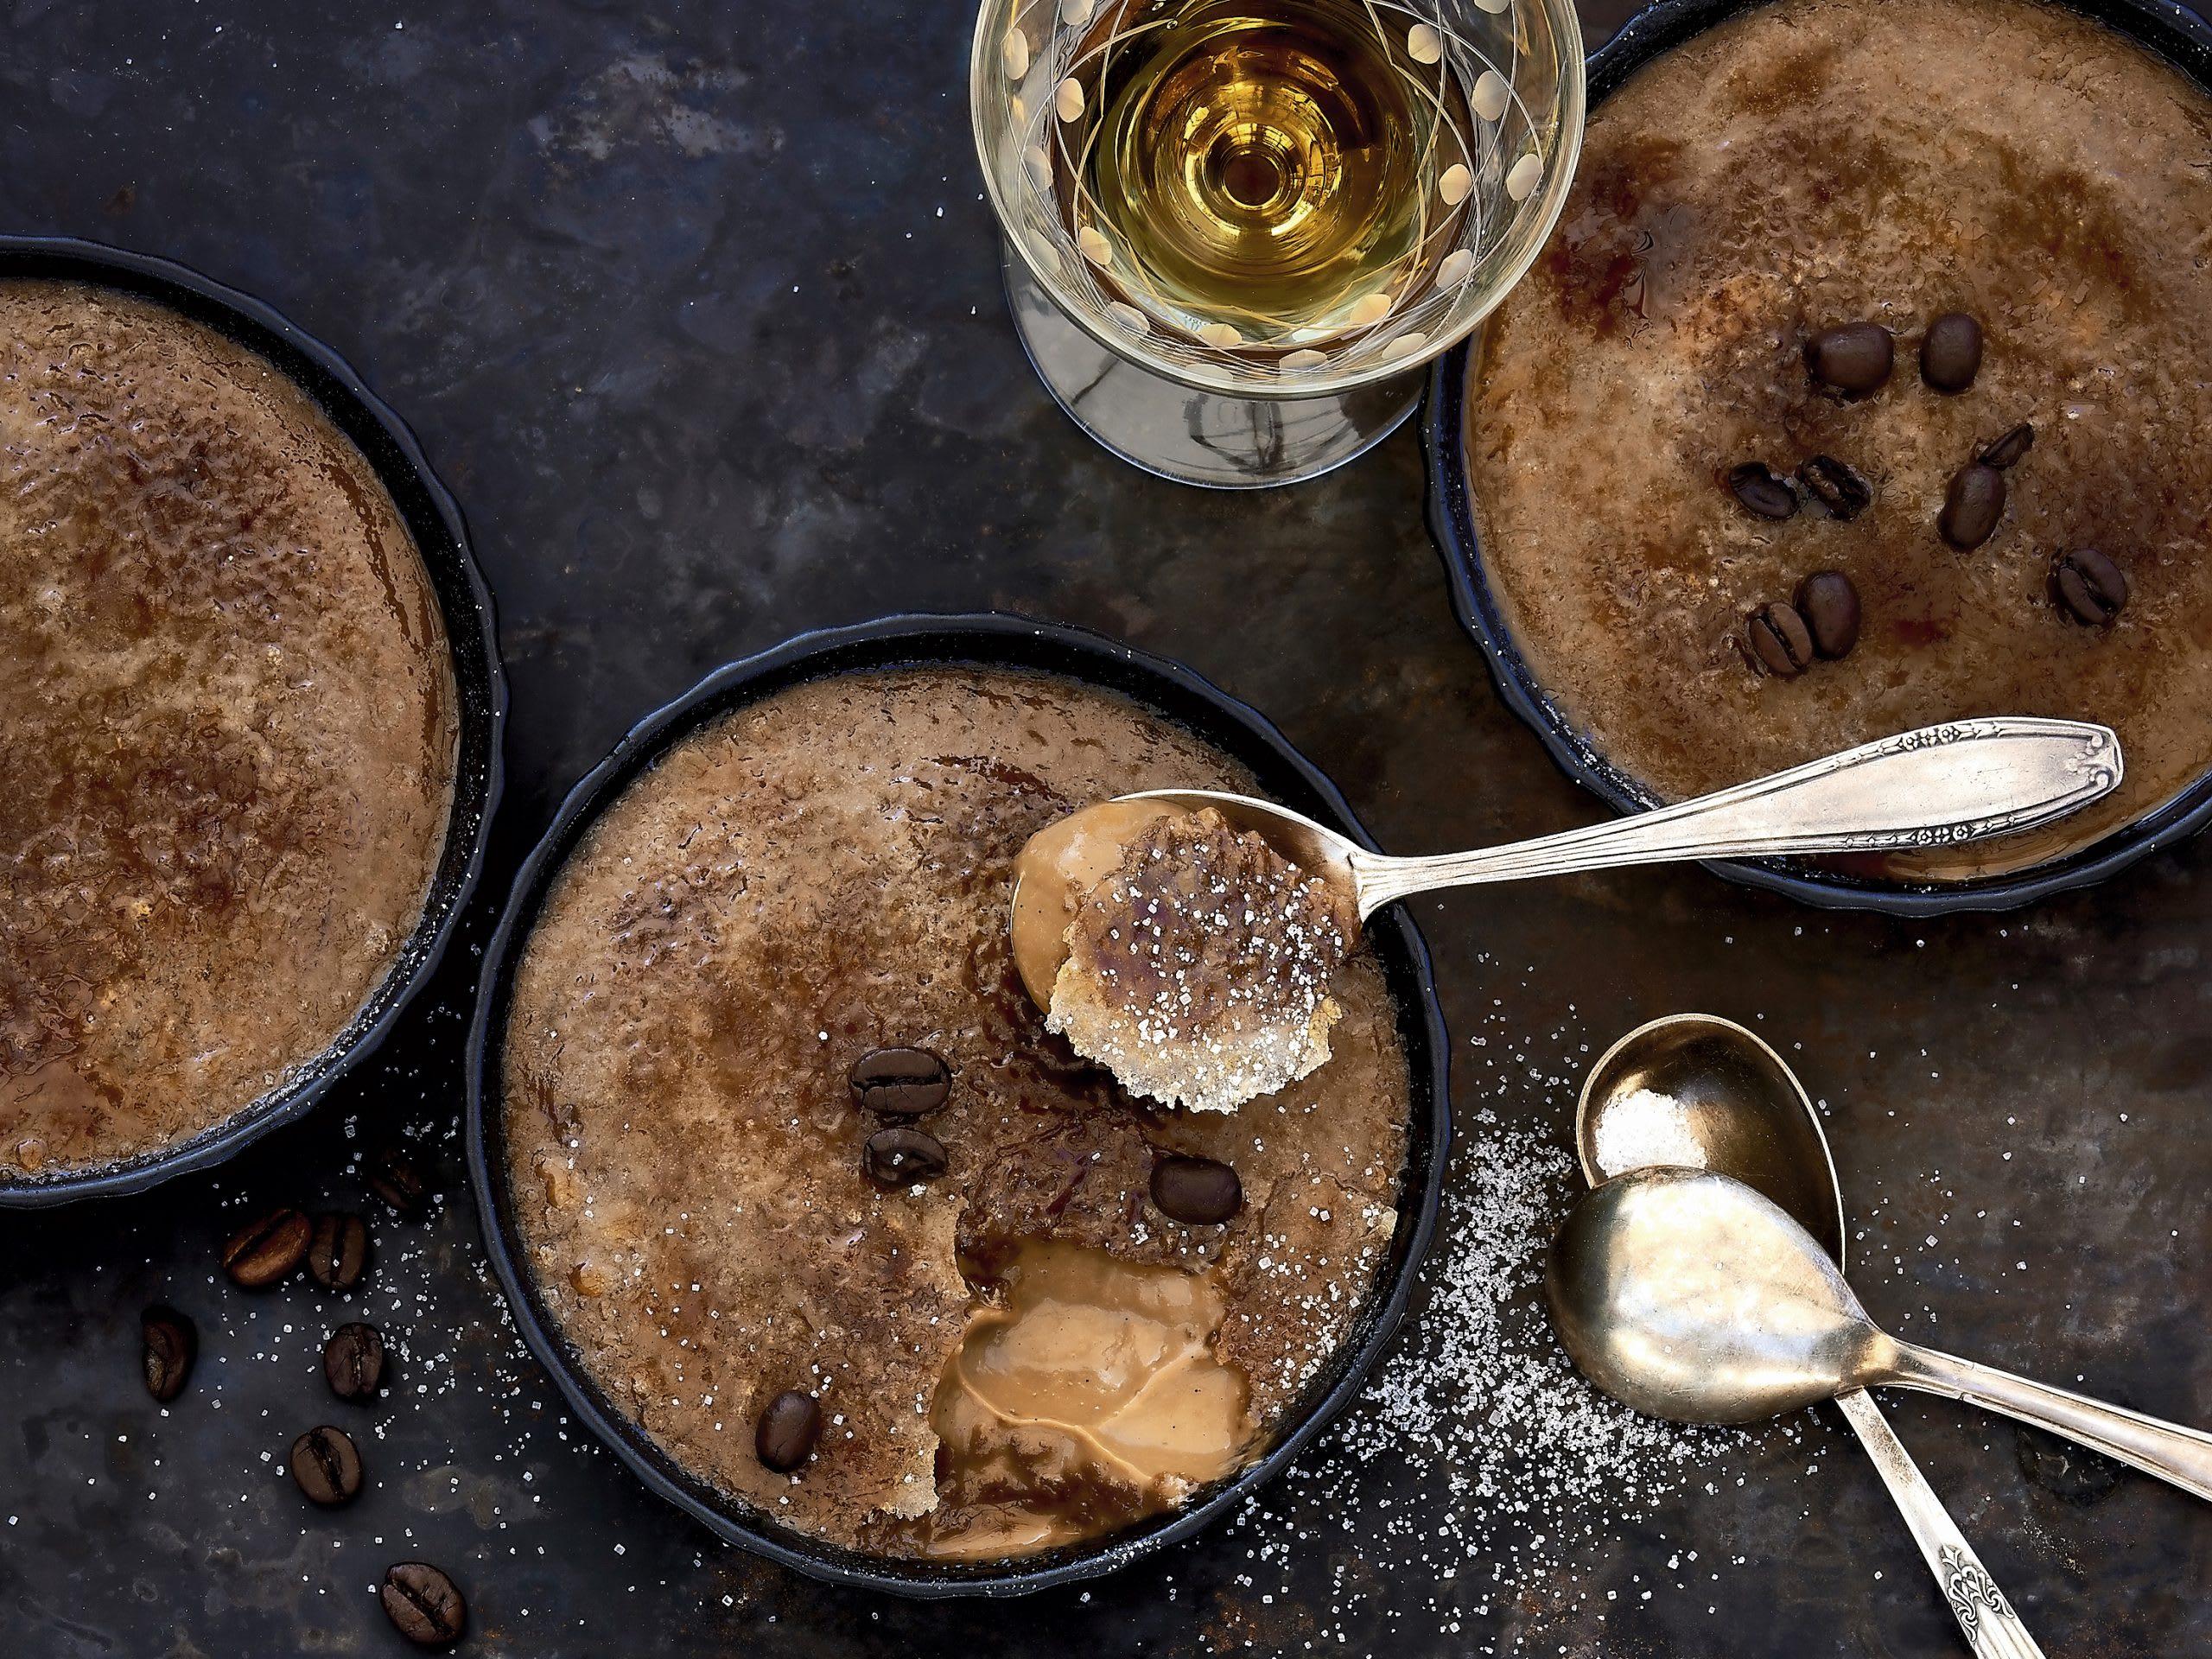 Flambierte Cognac-Kaffee-Crème